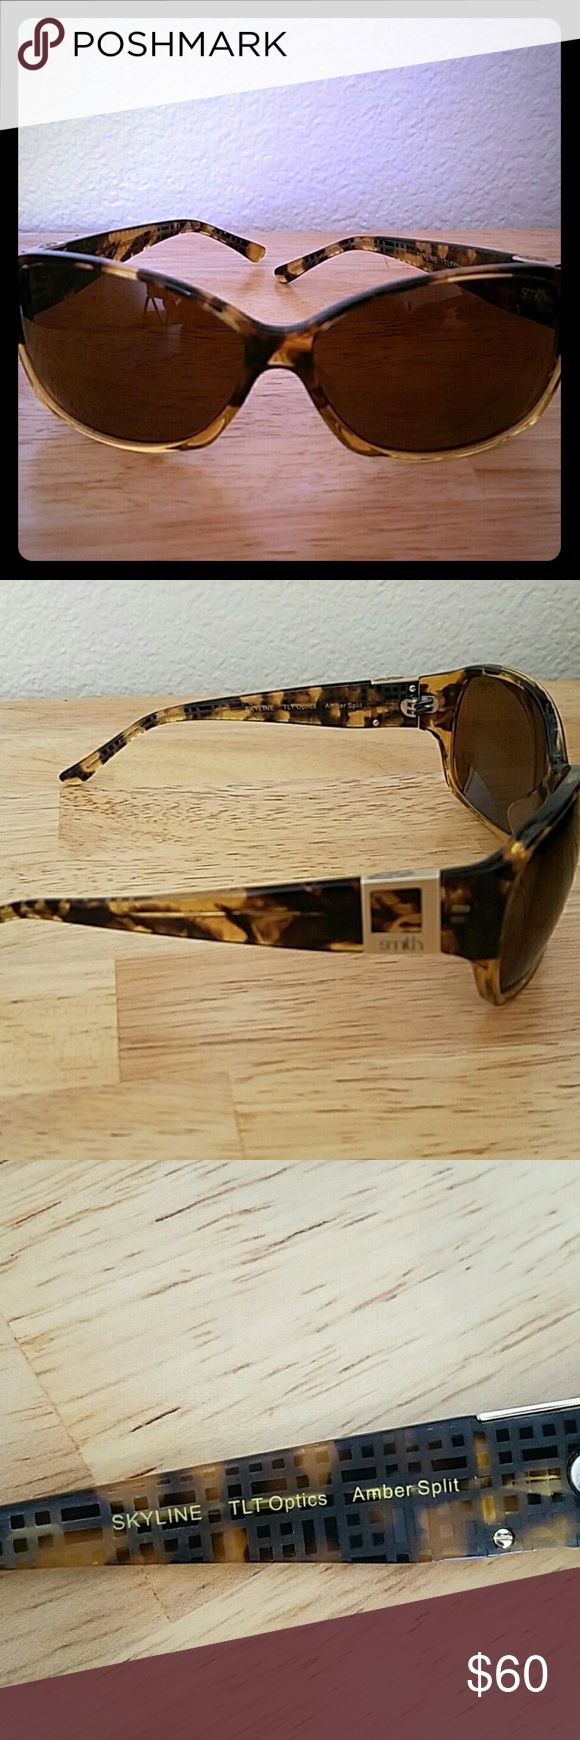 Smith Skyline Woman Polarized Sunglasses Polarized Smith Sunglasses in tortoise shell. Excelente Condition, no scratches no flaws Smith Optics Accessories Sunglasses